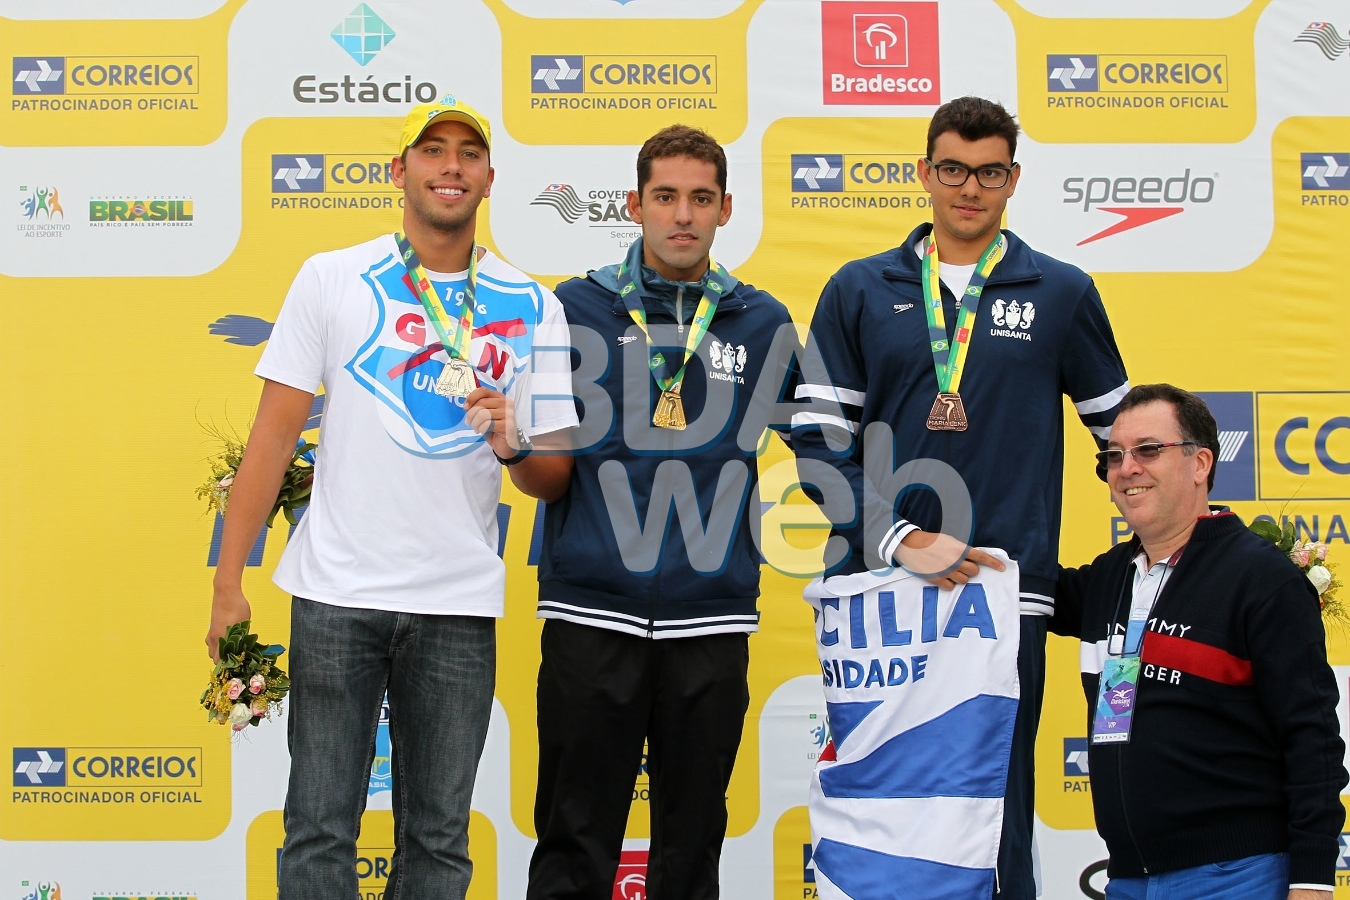 Carlos Rogerio Arapiraca. 54º Trofeu Maria Lenk de Maratonas Aquaticas na raia Olimpica da USP. 26 de abril de 2014, Sao Paulo, SP, Brasil. Foto: Satiro Sodre/SSPress